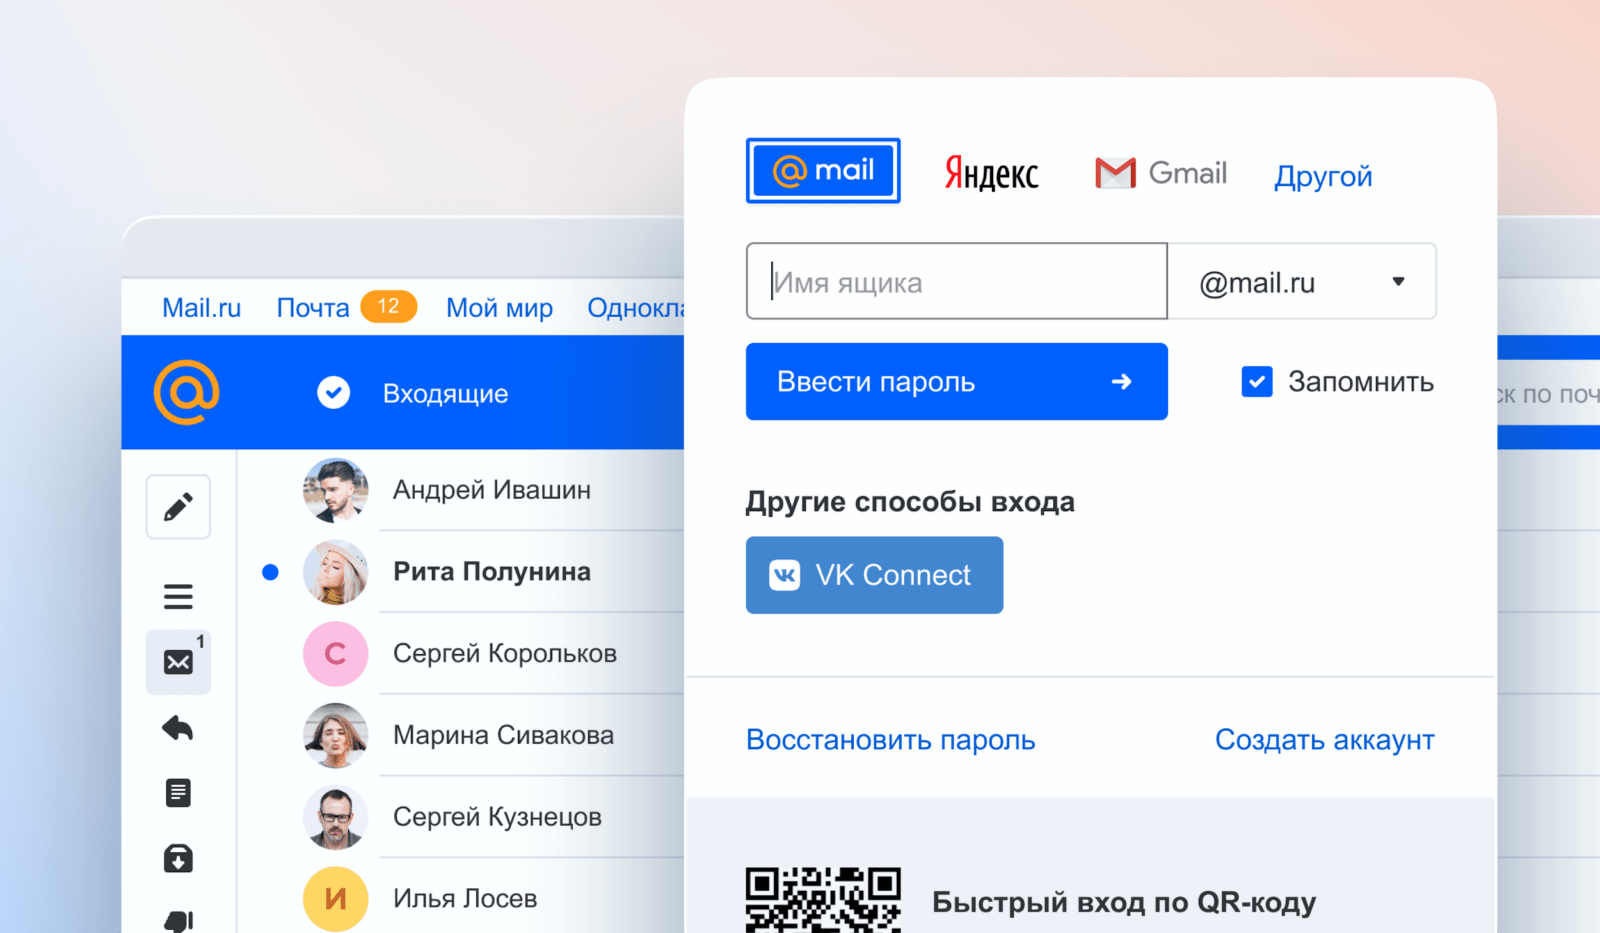 В Почту и Облако Mail.ru можно войти через VK Connect (1234)